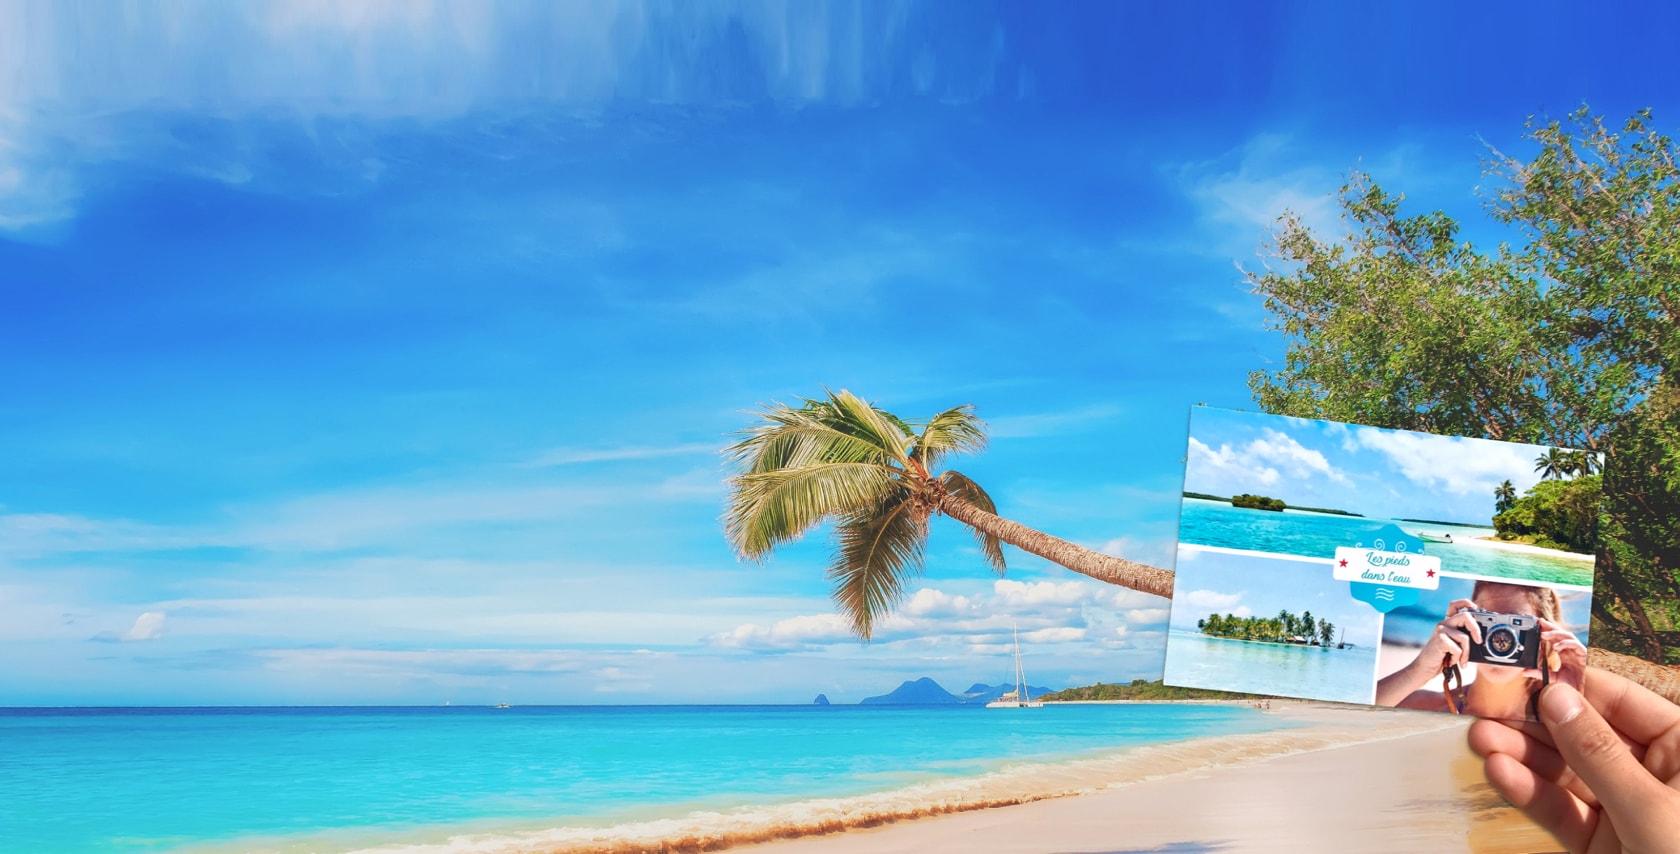 beach_header.ef775f8209c729597c71